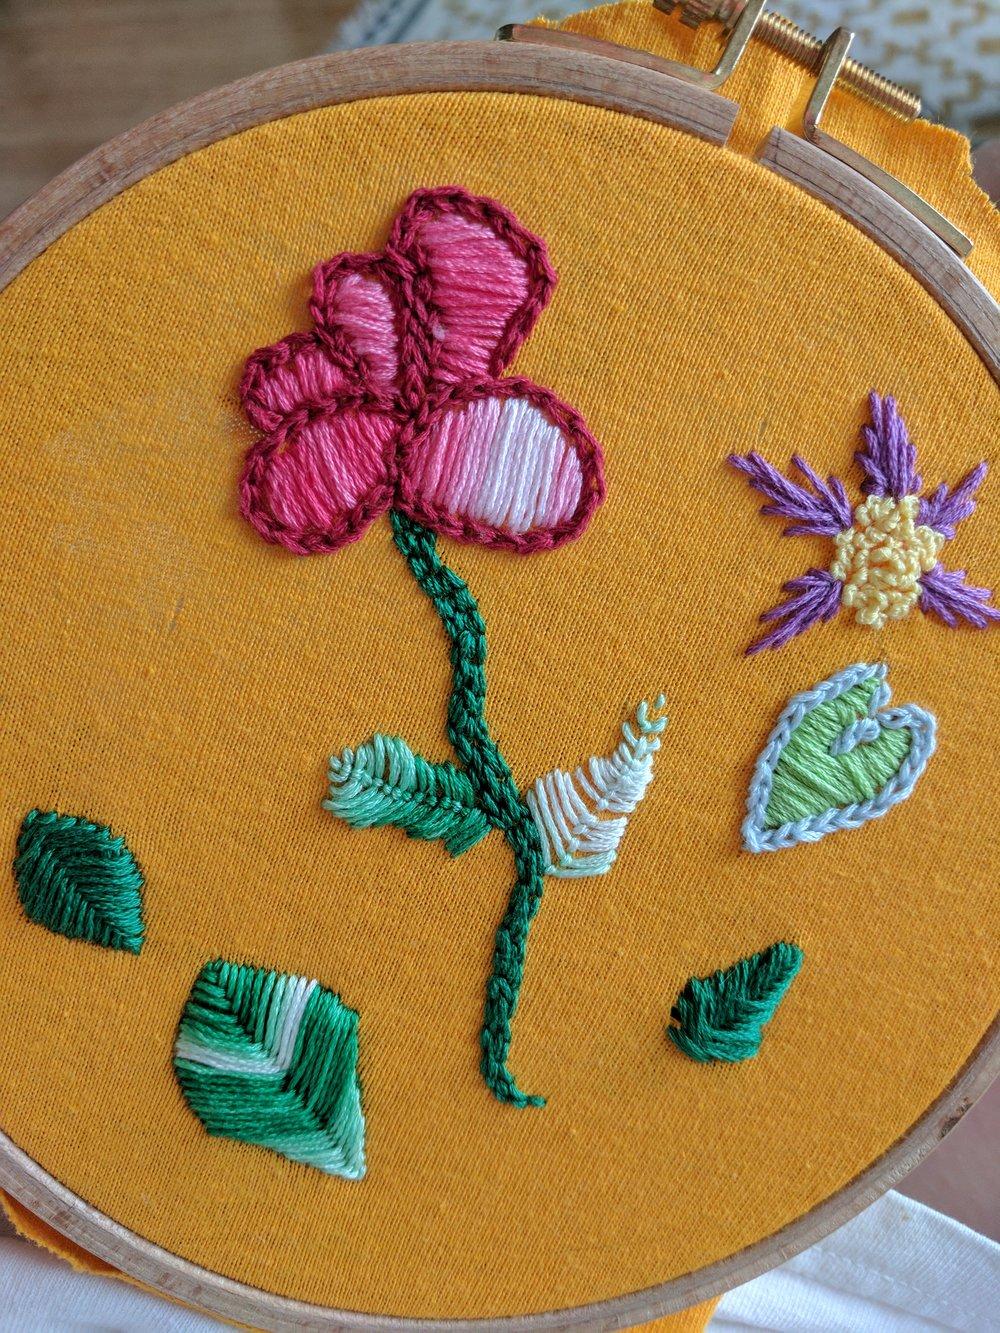 Embroidery_#.jpg